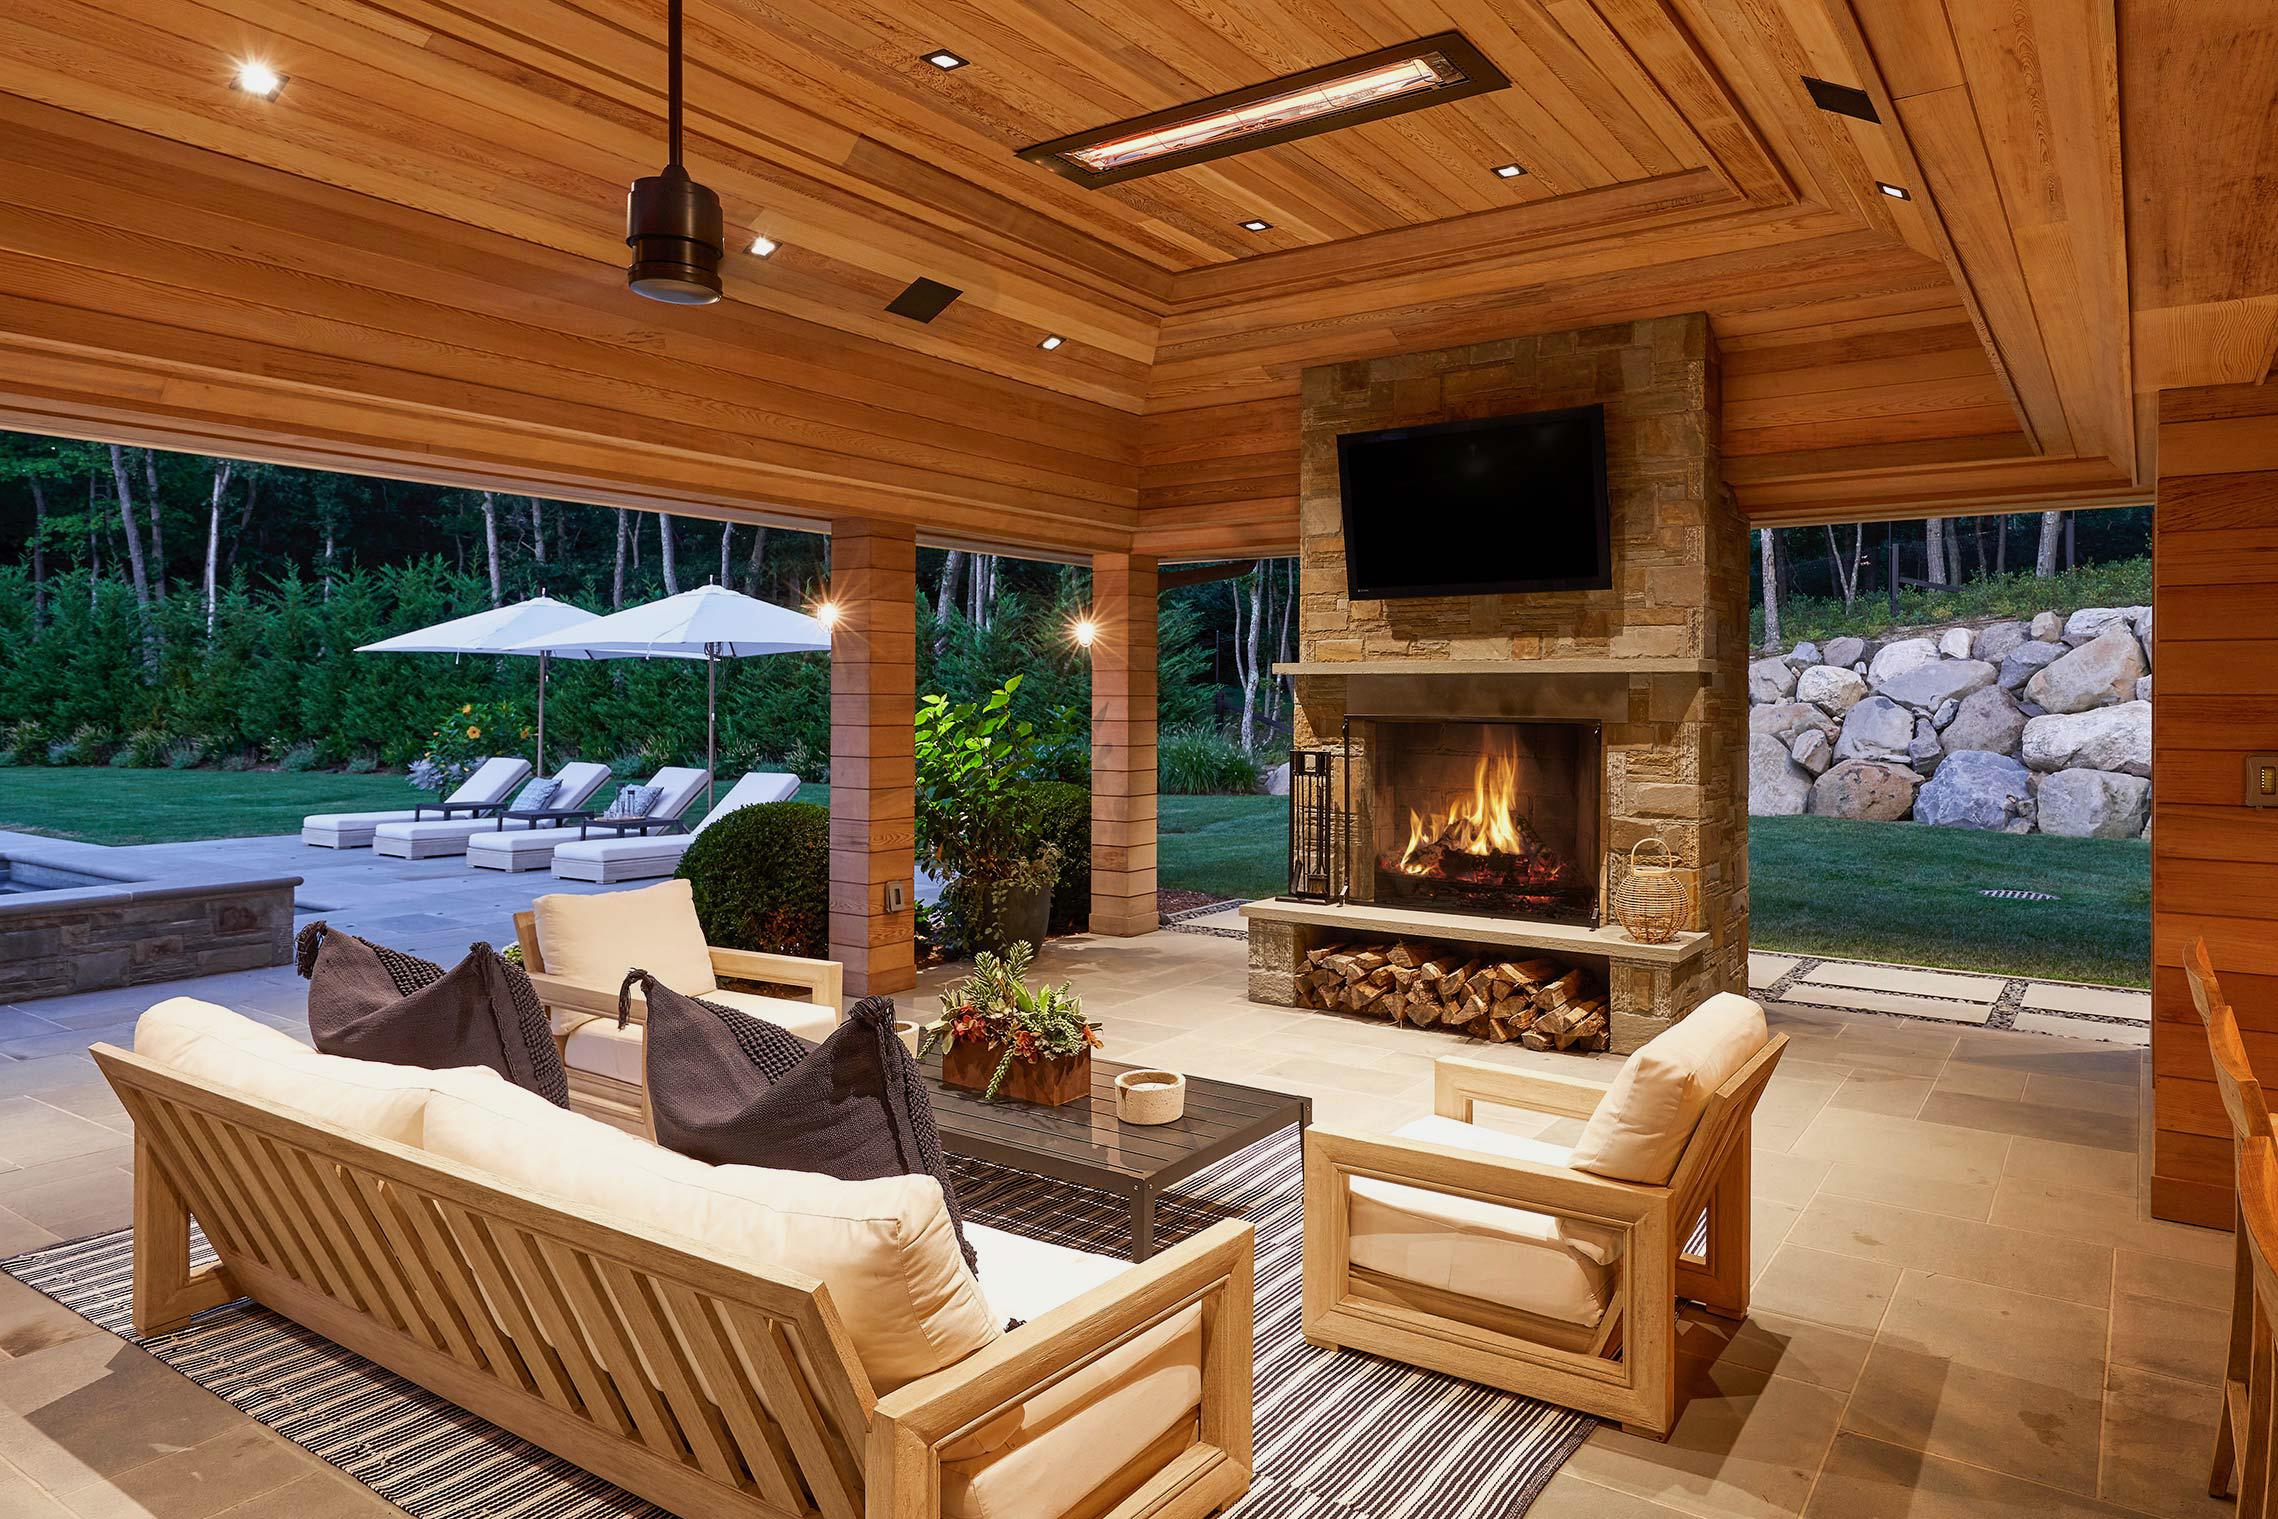 Outdoor Living Space Design outdoor living space design in the hamptons | backyard